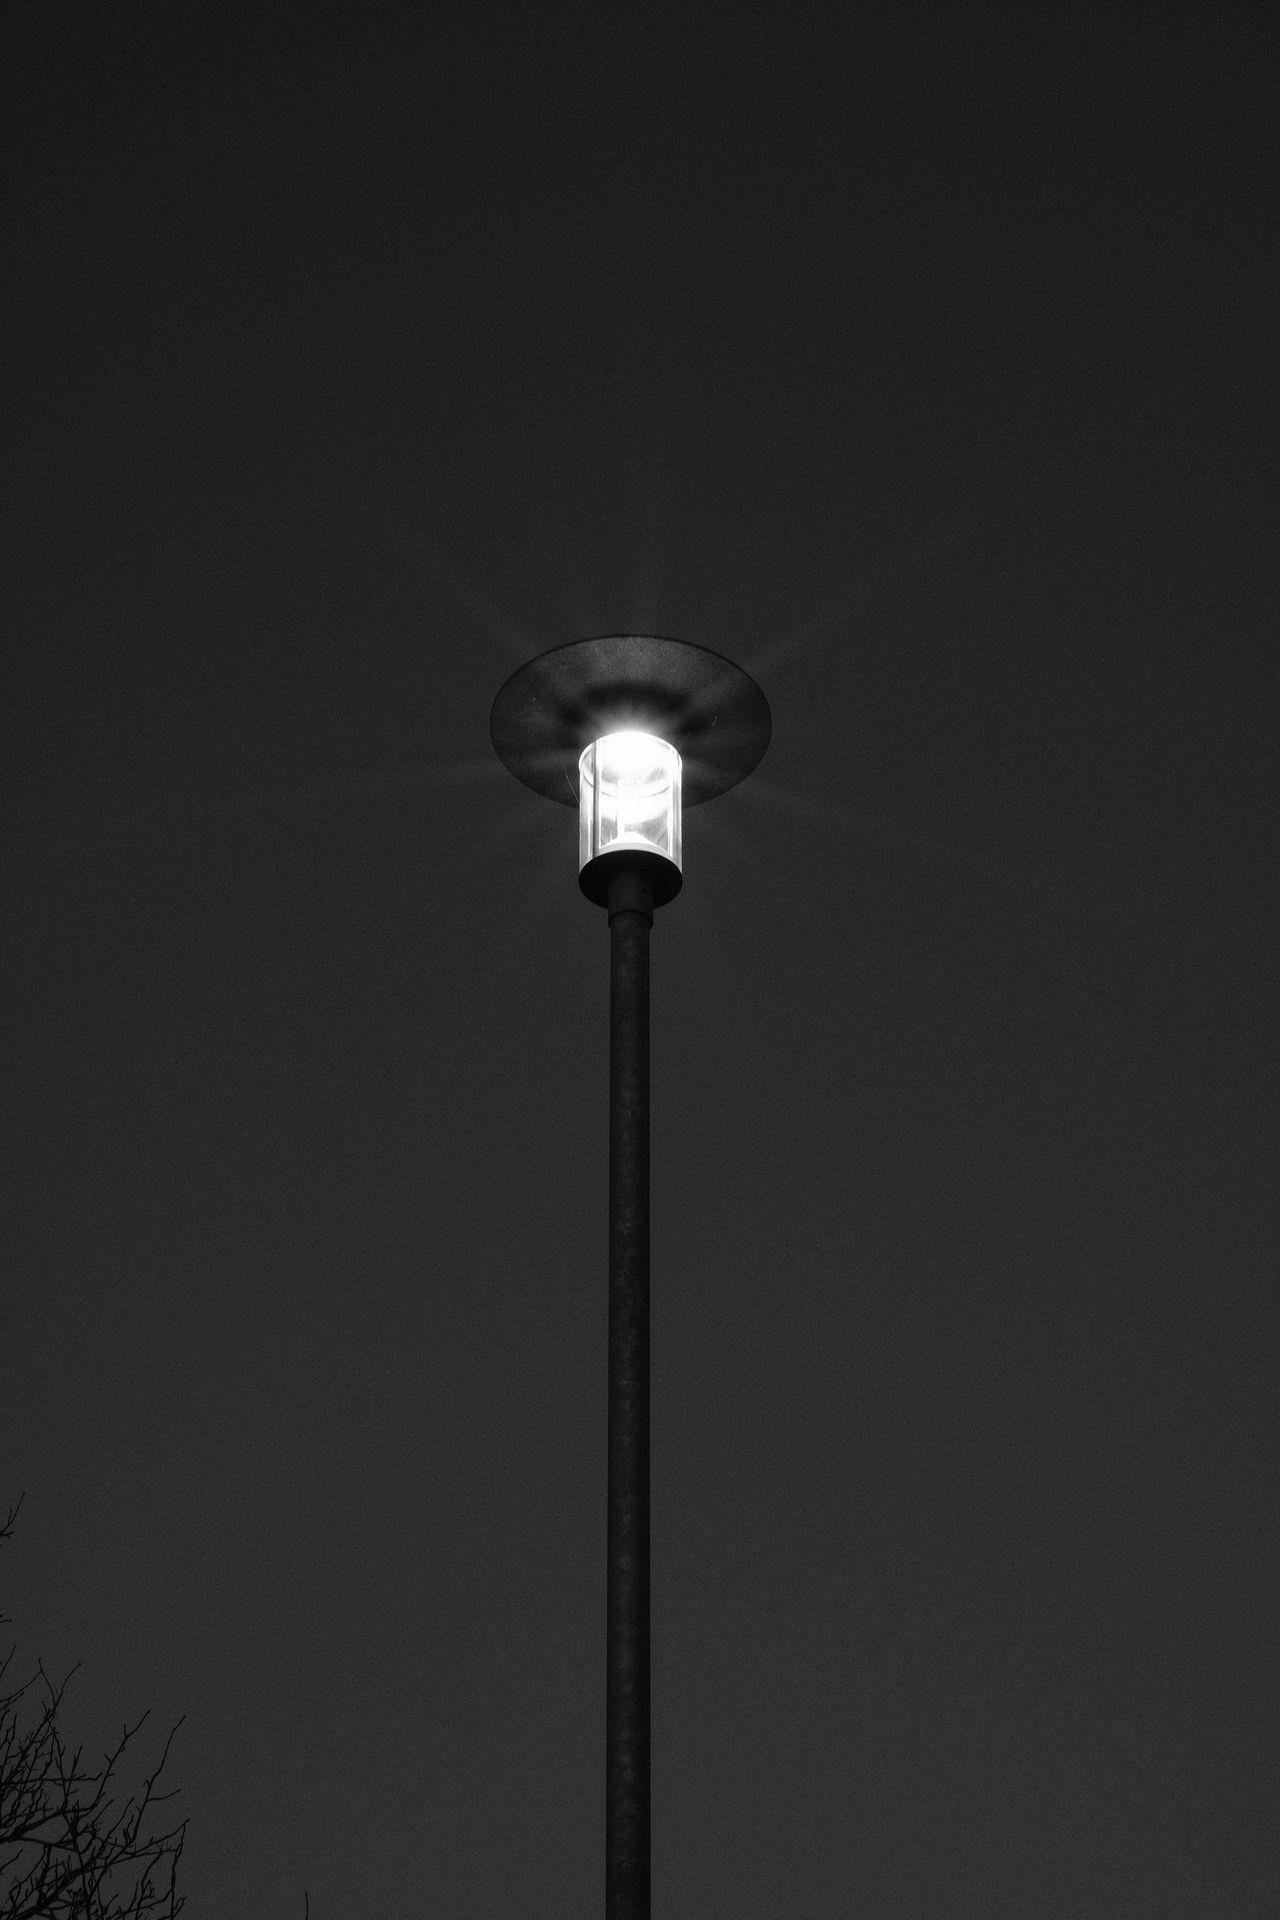 Good evening Street Light Street Lamp Lights Gatlampa Taking Photos Eyeem Sweden Fujilove Monochrome Bnw Svartvitt AcroS Xt-2 Fujifilm EyeEm Bnw Sweden December Dark Sverige Fujifilm_xseries Kungshamn FUJIFILM X-T2 Gatljus No People Lighting Equipment EyeEm